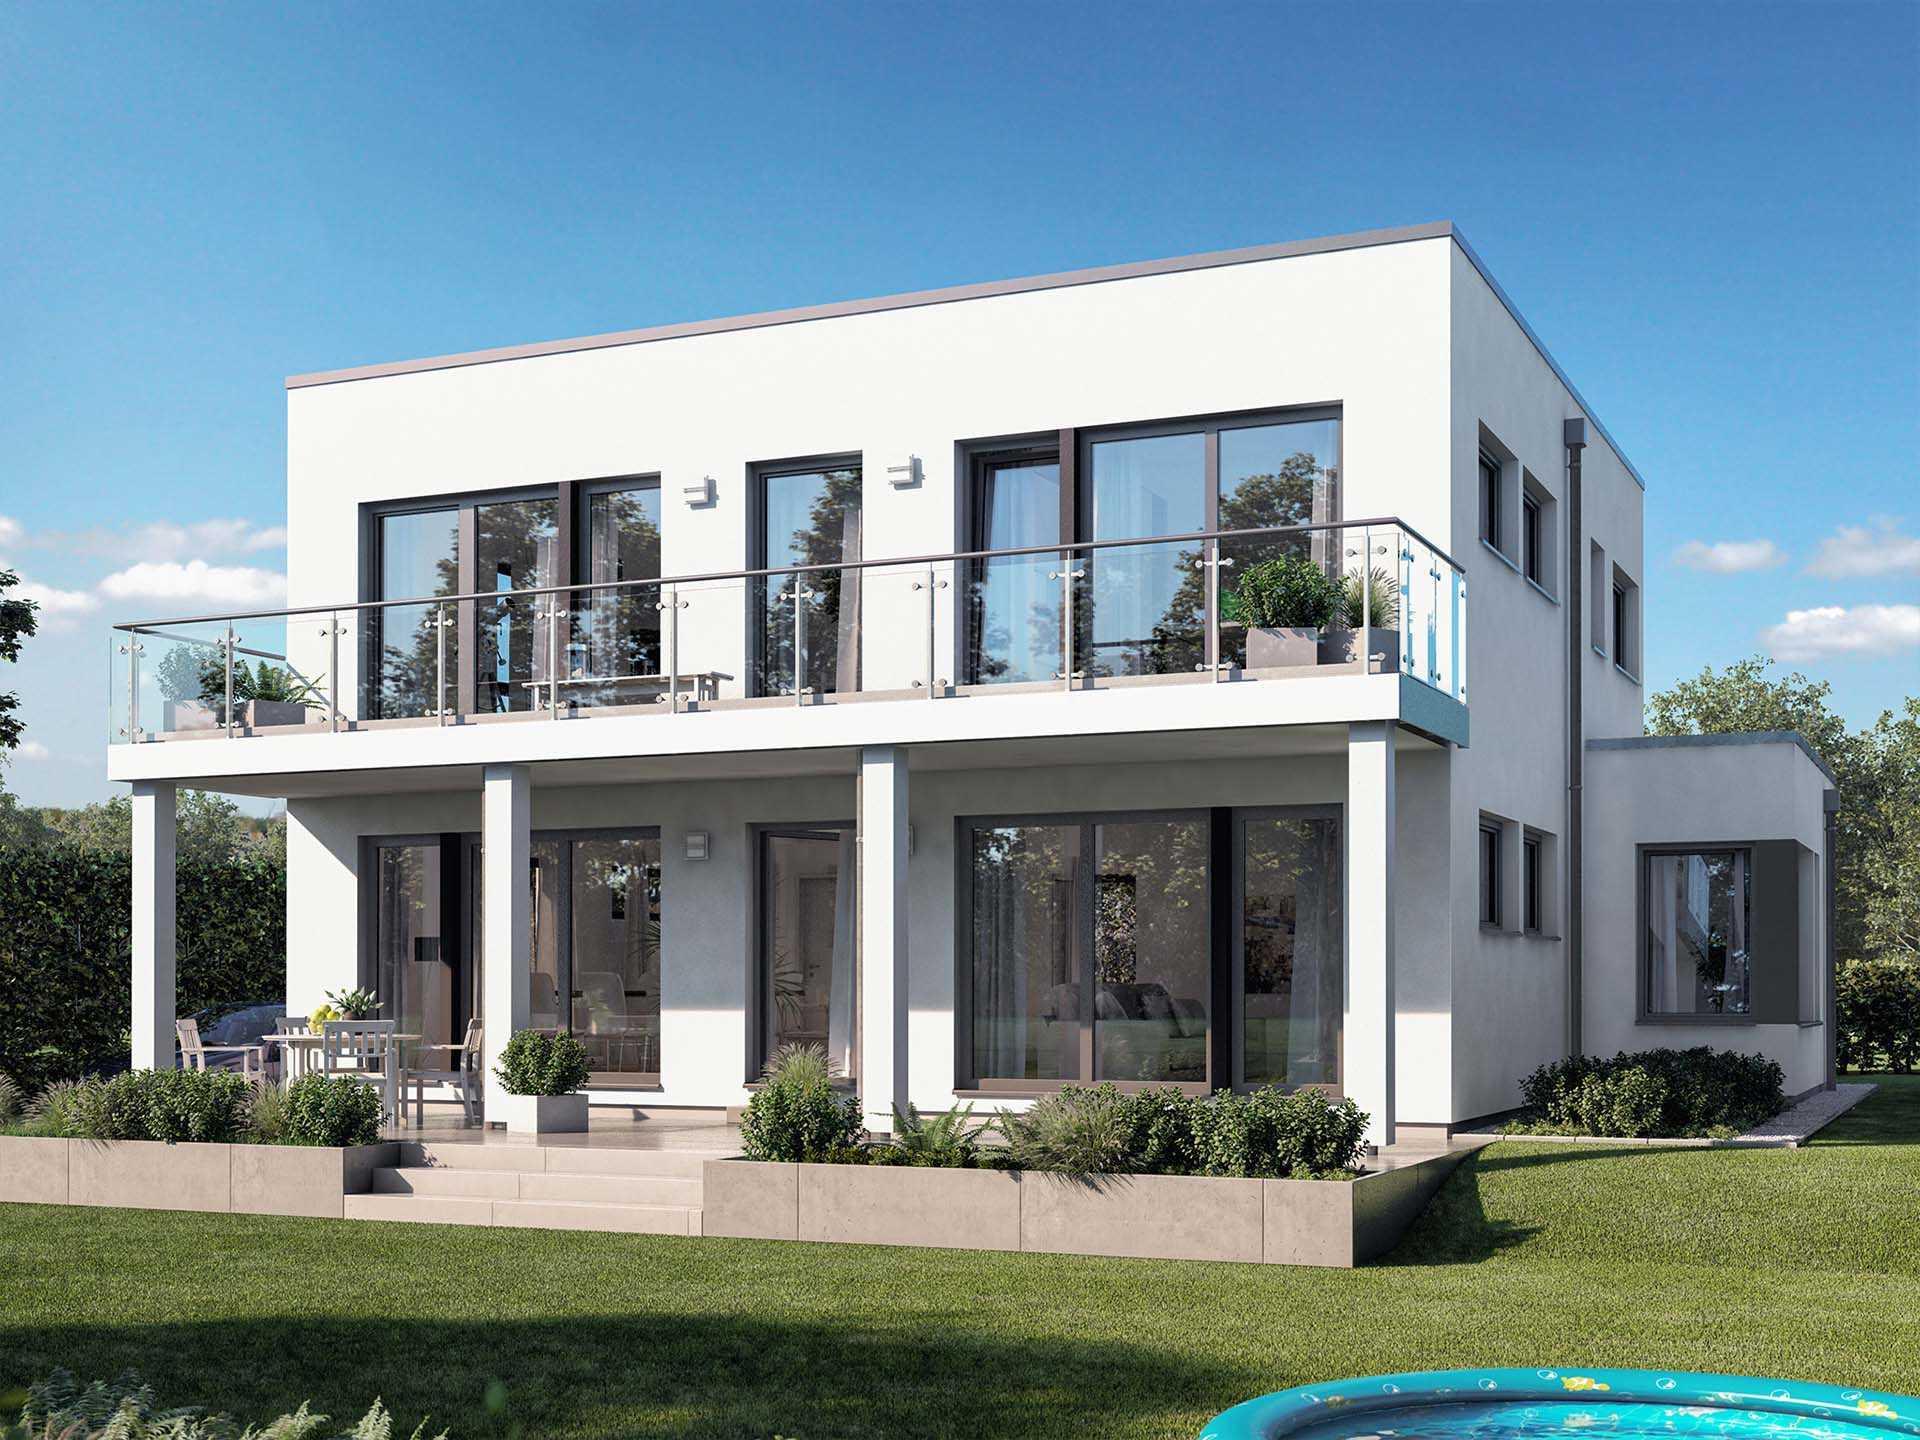 living fertighaus gmbh bauweise qualit t. Black Bedroom Furniture Sets. Home Design Ideas